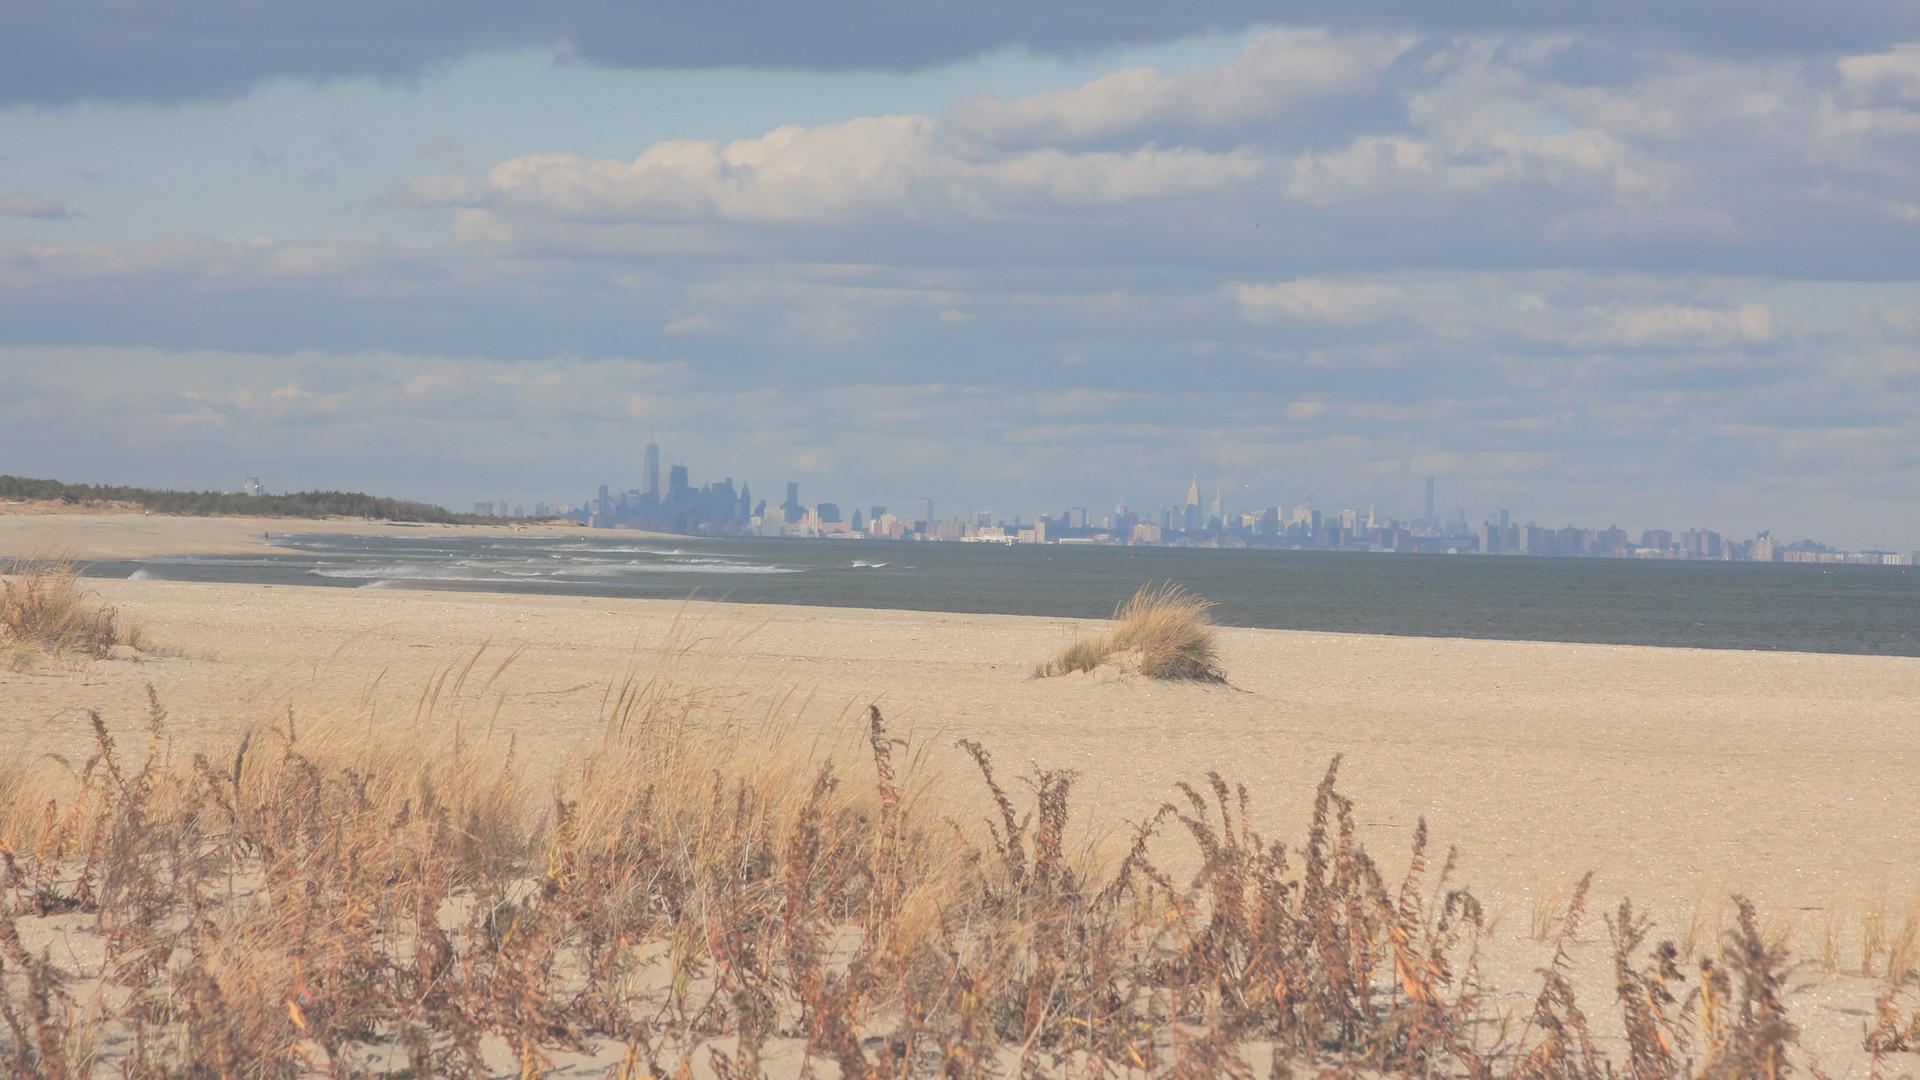 Sandy Hook, NJ